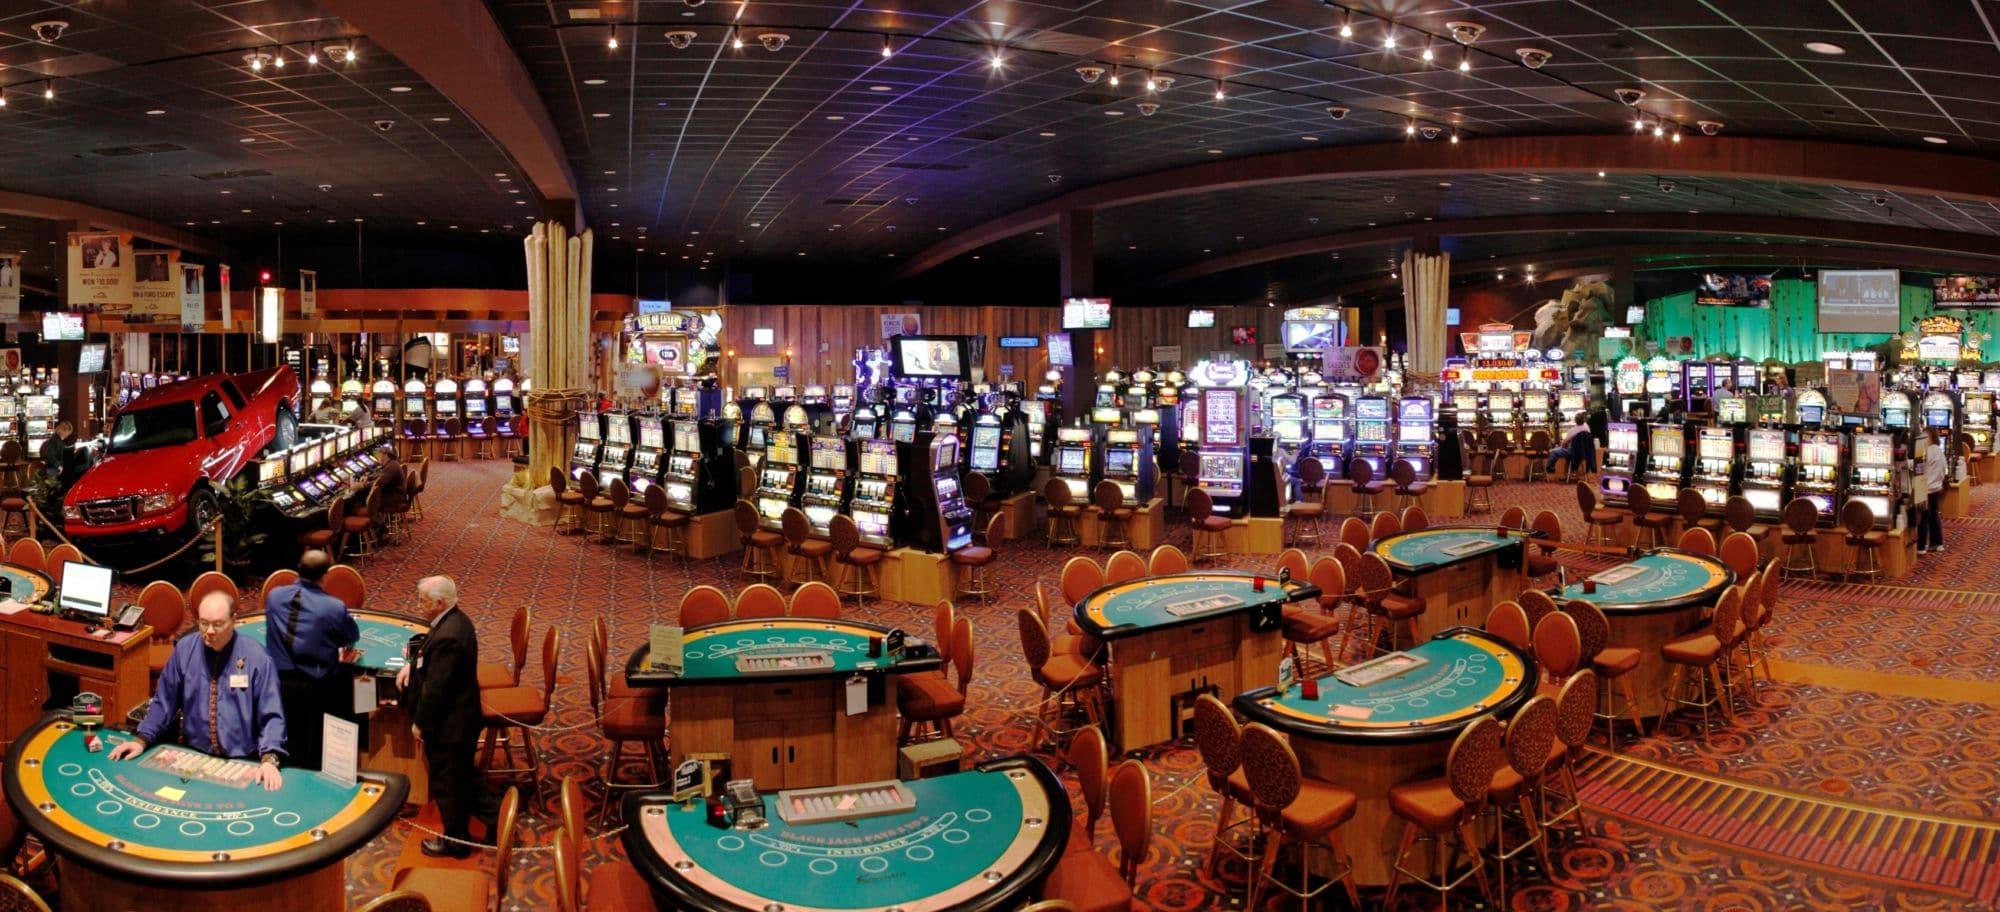 kewadin-casino-st.-ignance-mi